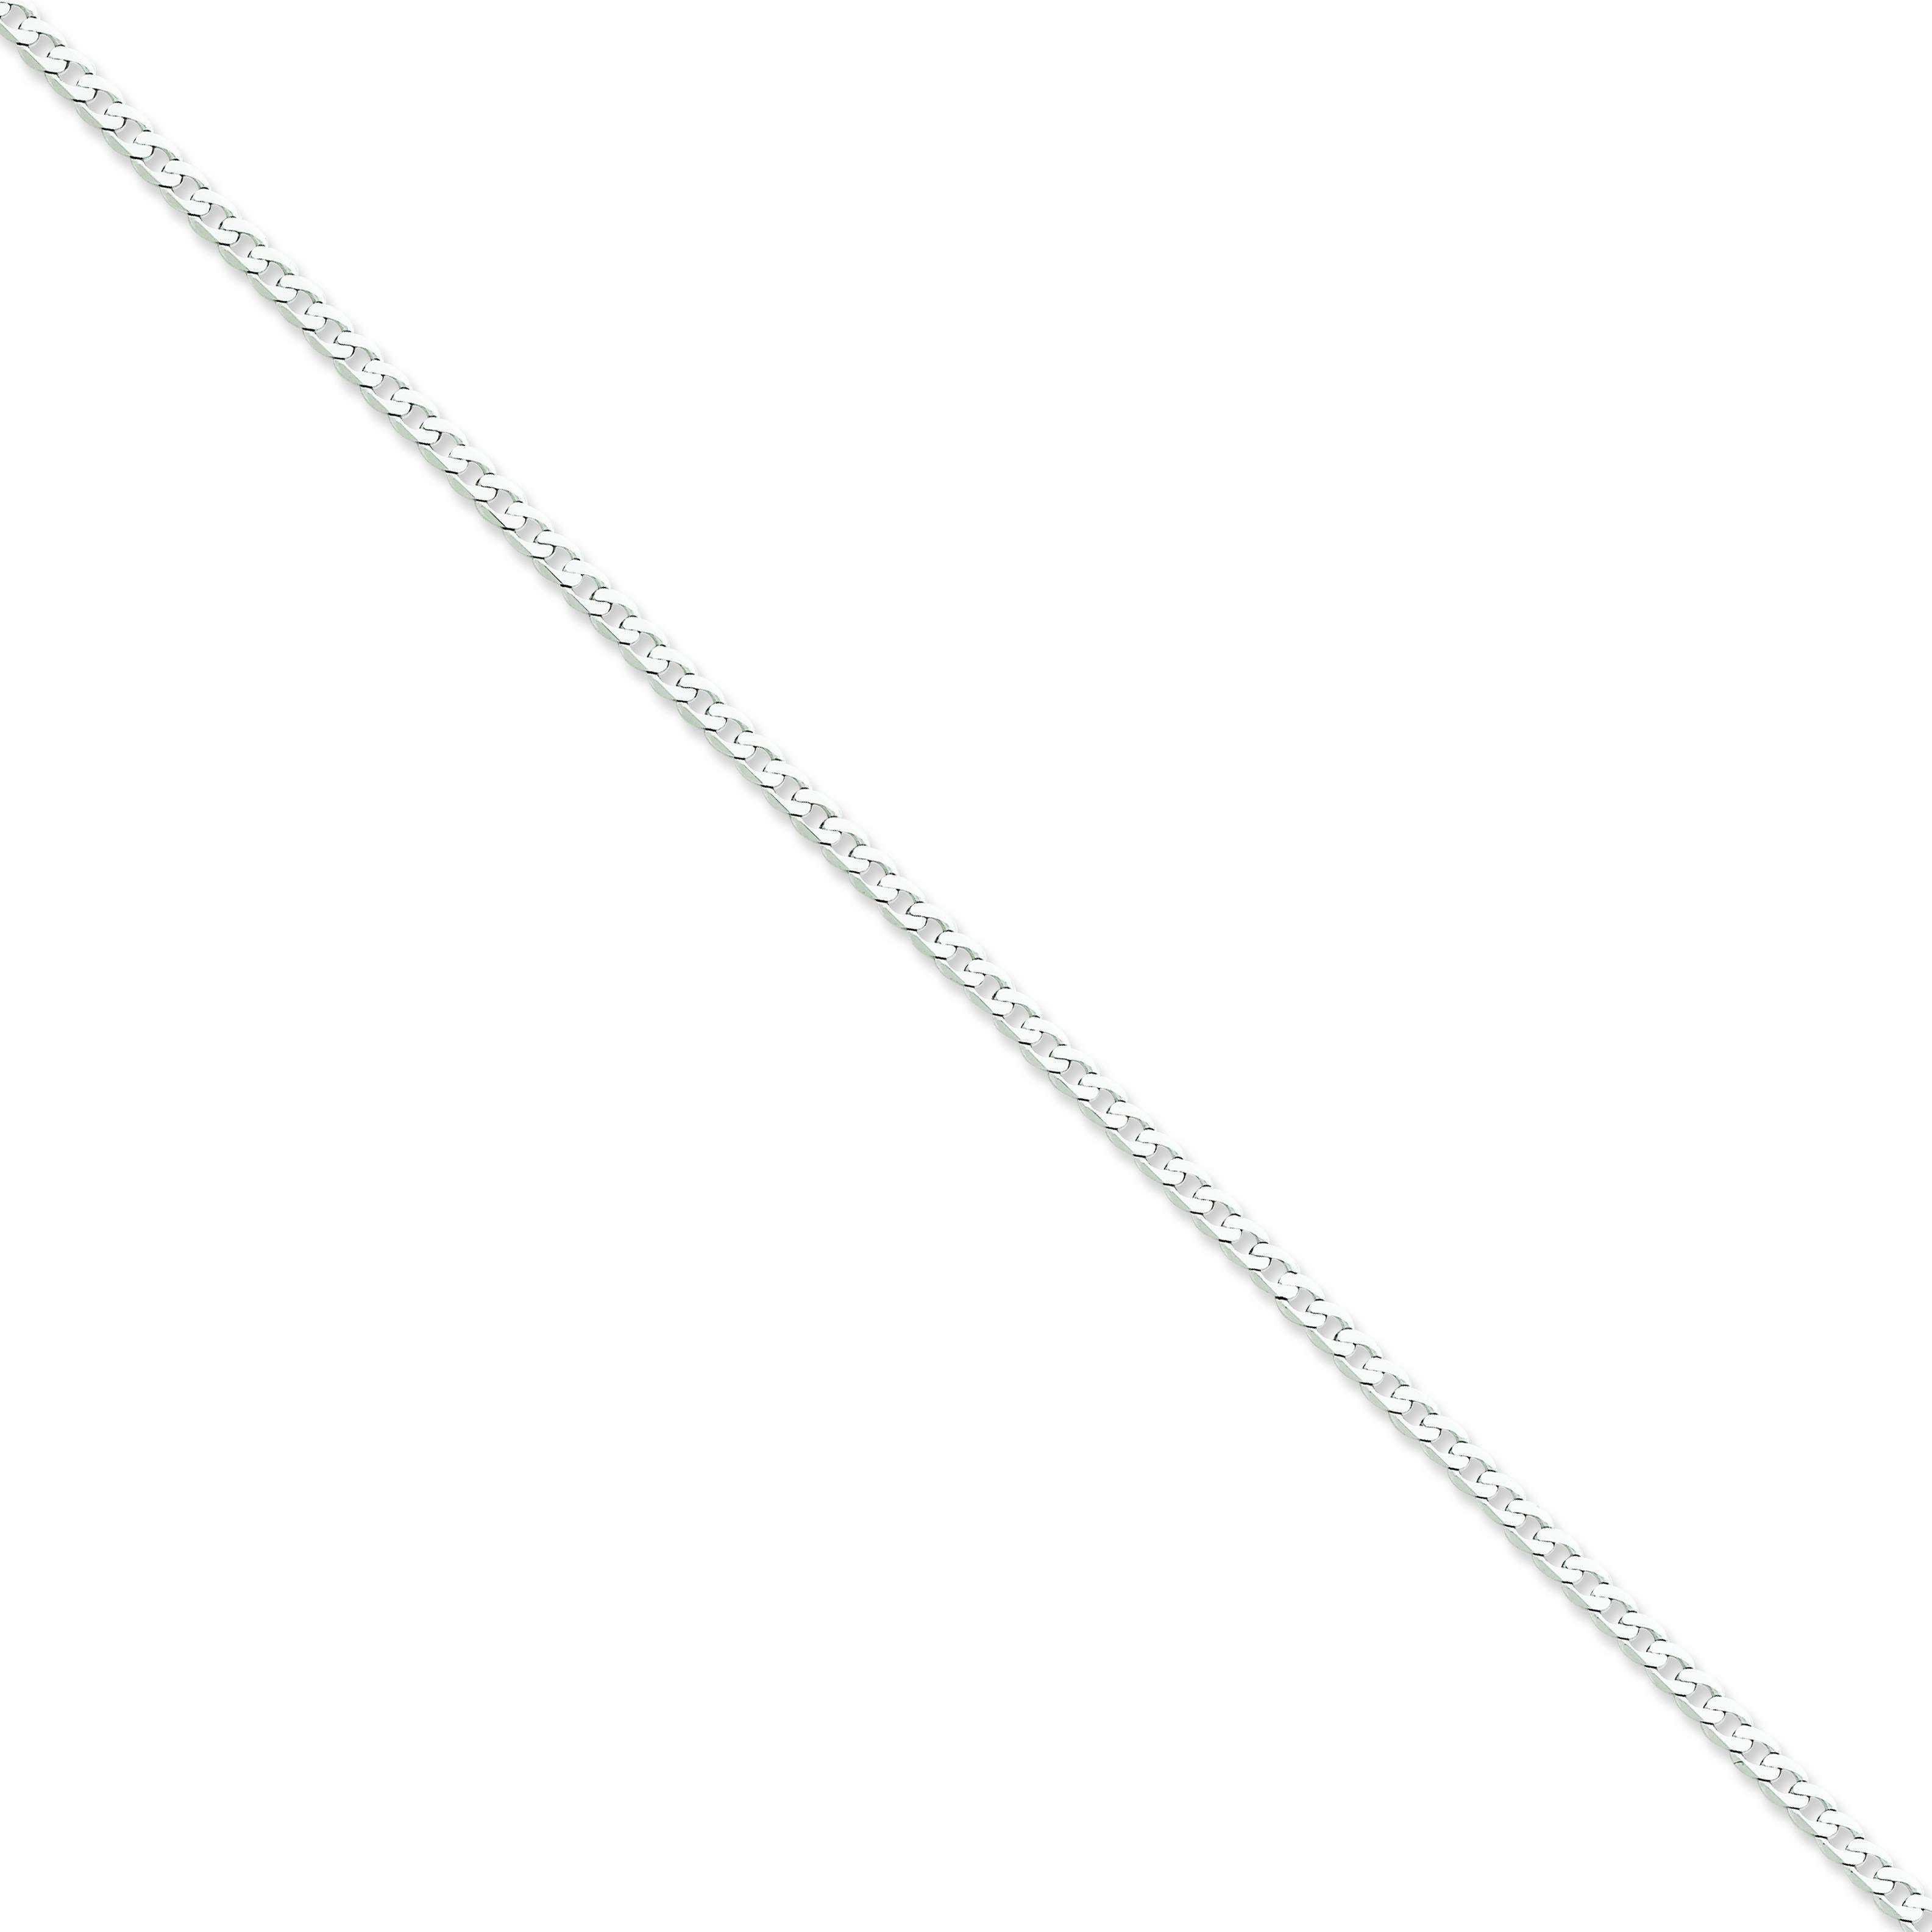 14k Yellow Gold 8 inch 2.90 mm Flat Curb Chain Bracelet